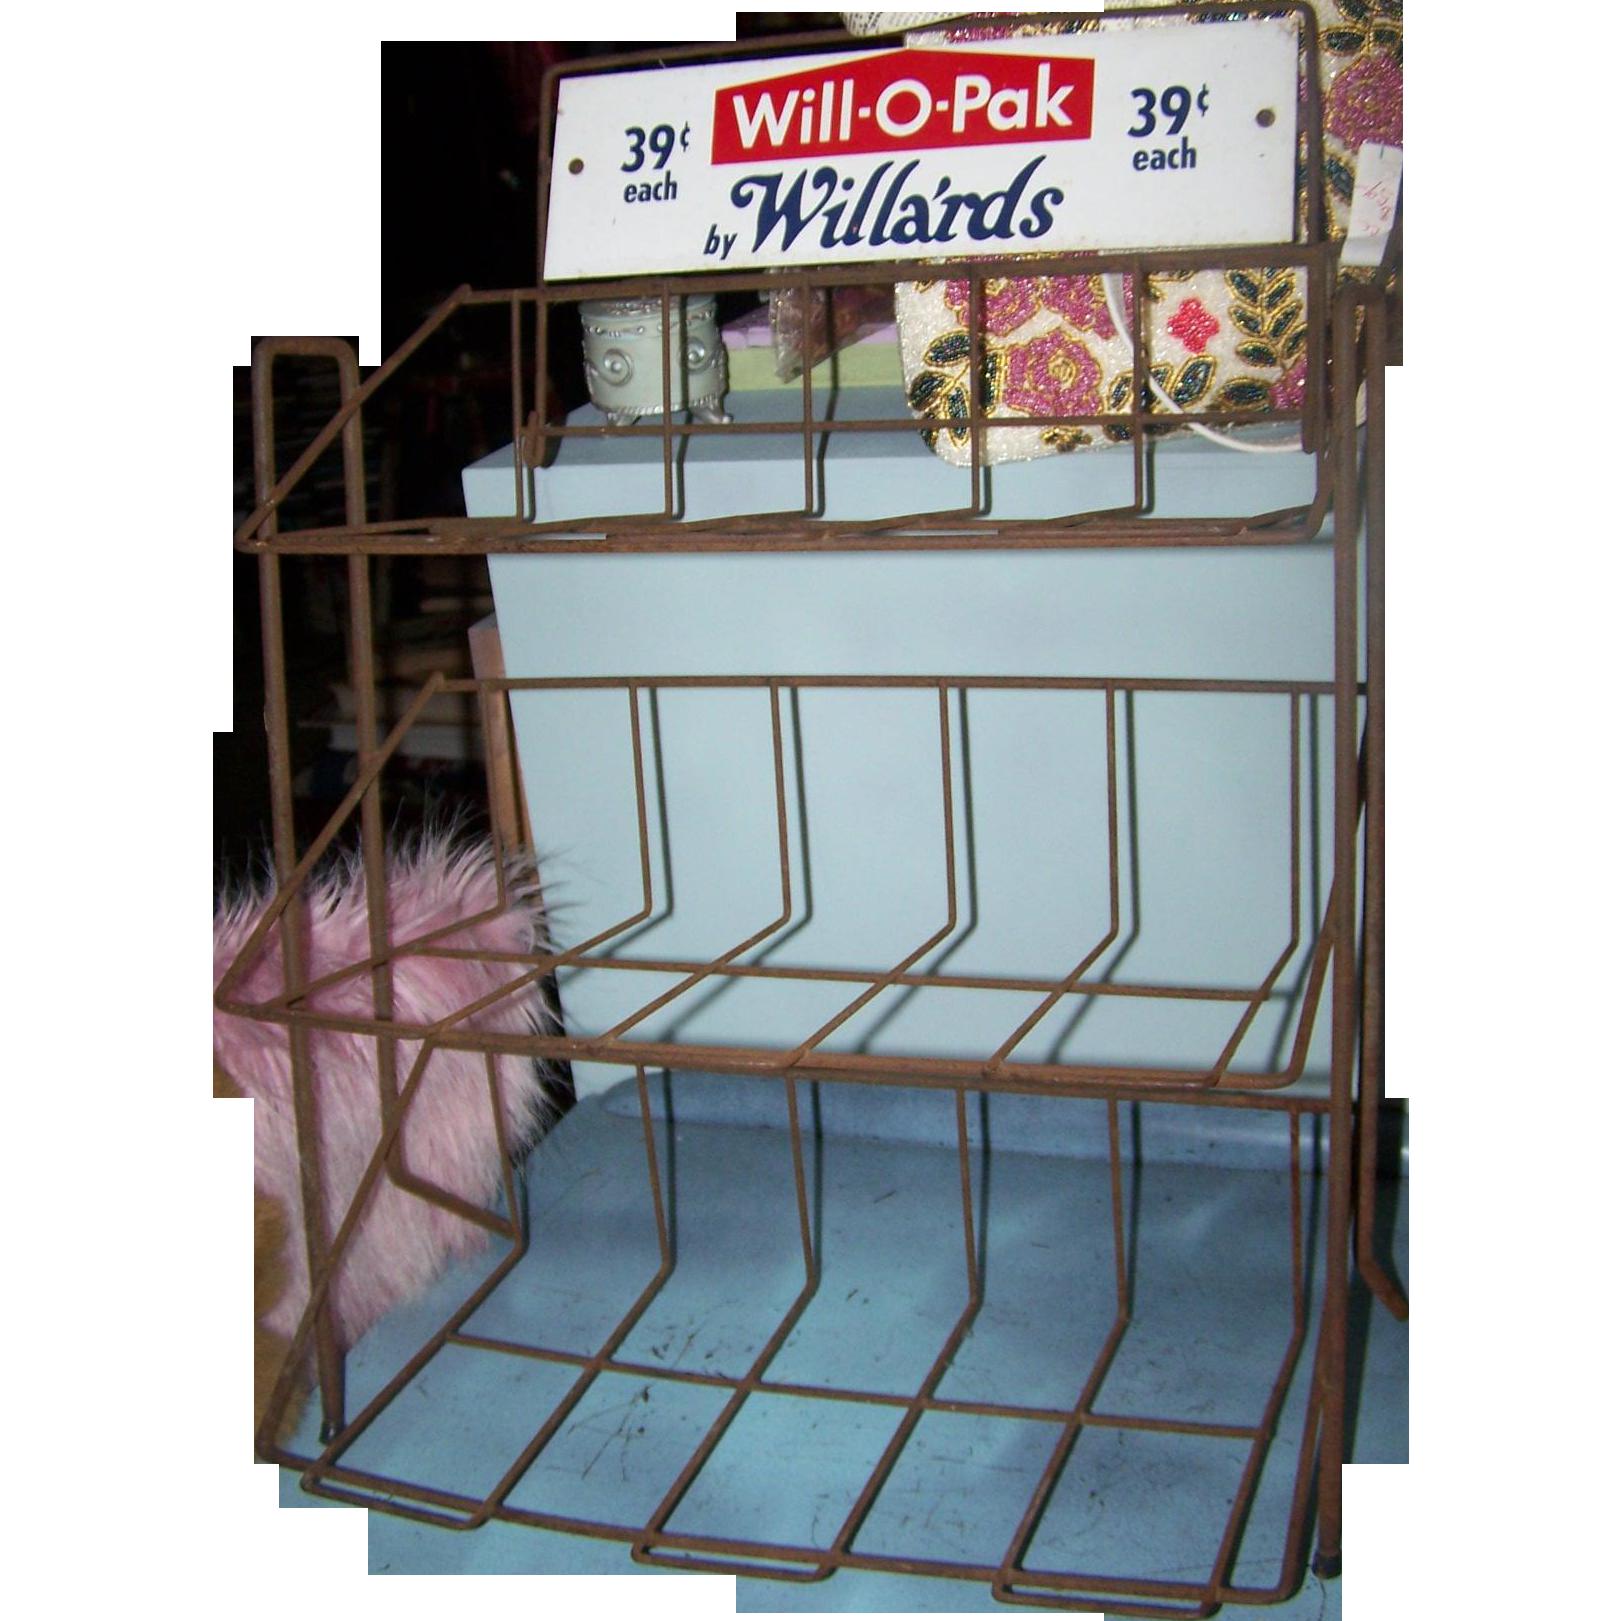 Vintage Collectible Advertising Store Display Metalware Rack